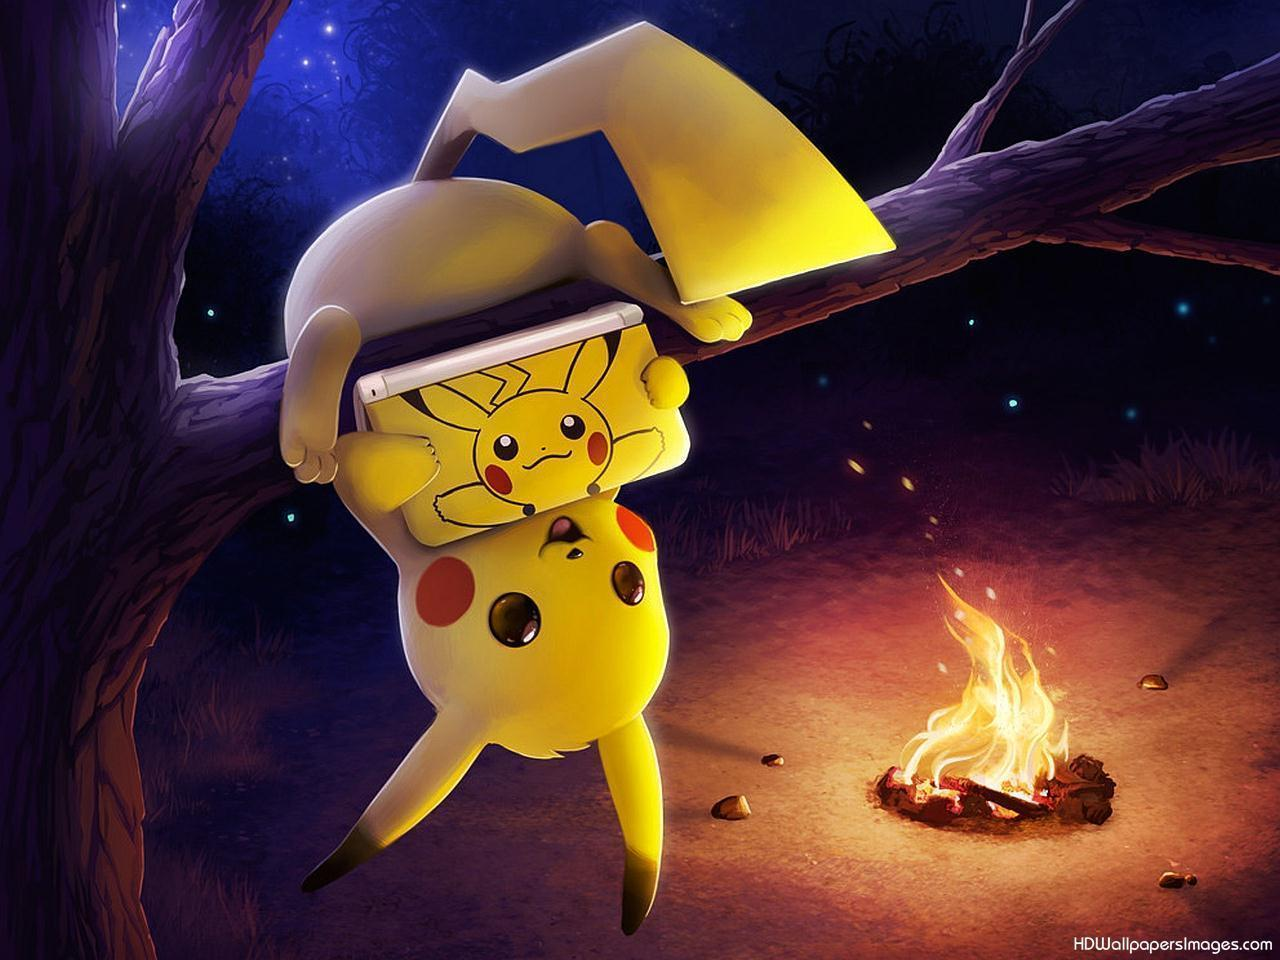 Pokémon Pikachu Wallpapers - Wallpaper Cave